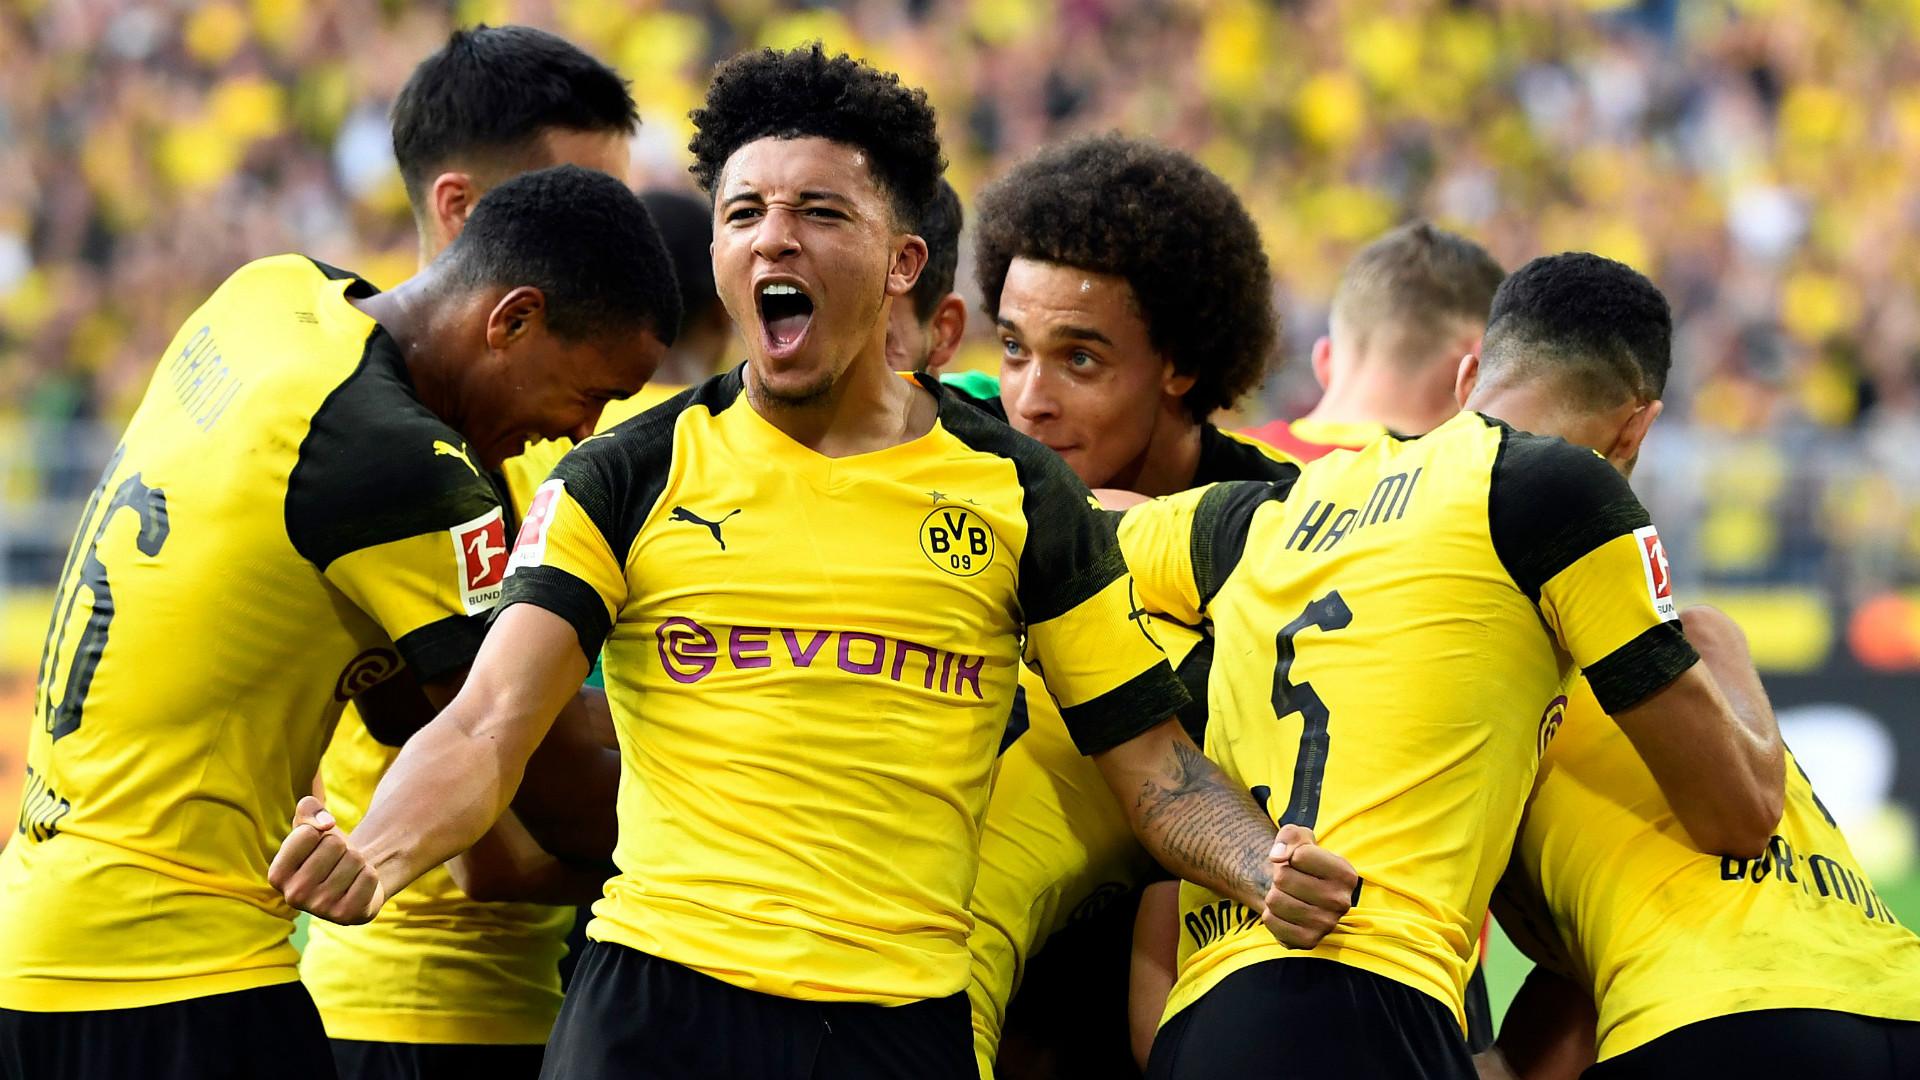 Move over Man City, PSG & Juve - Dortmund are Europe's most exciting team - Goal.com